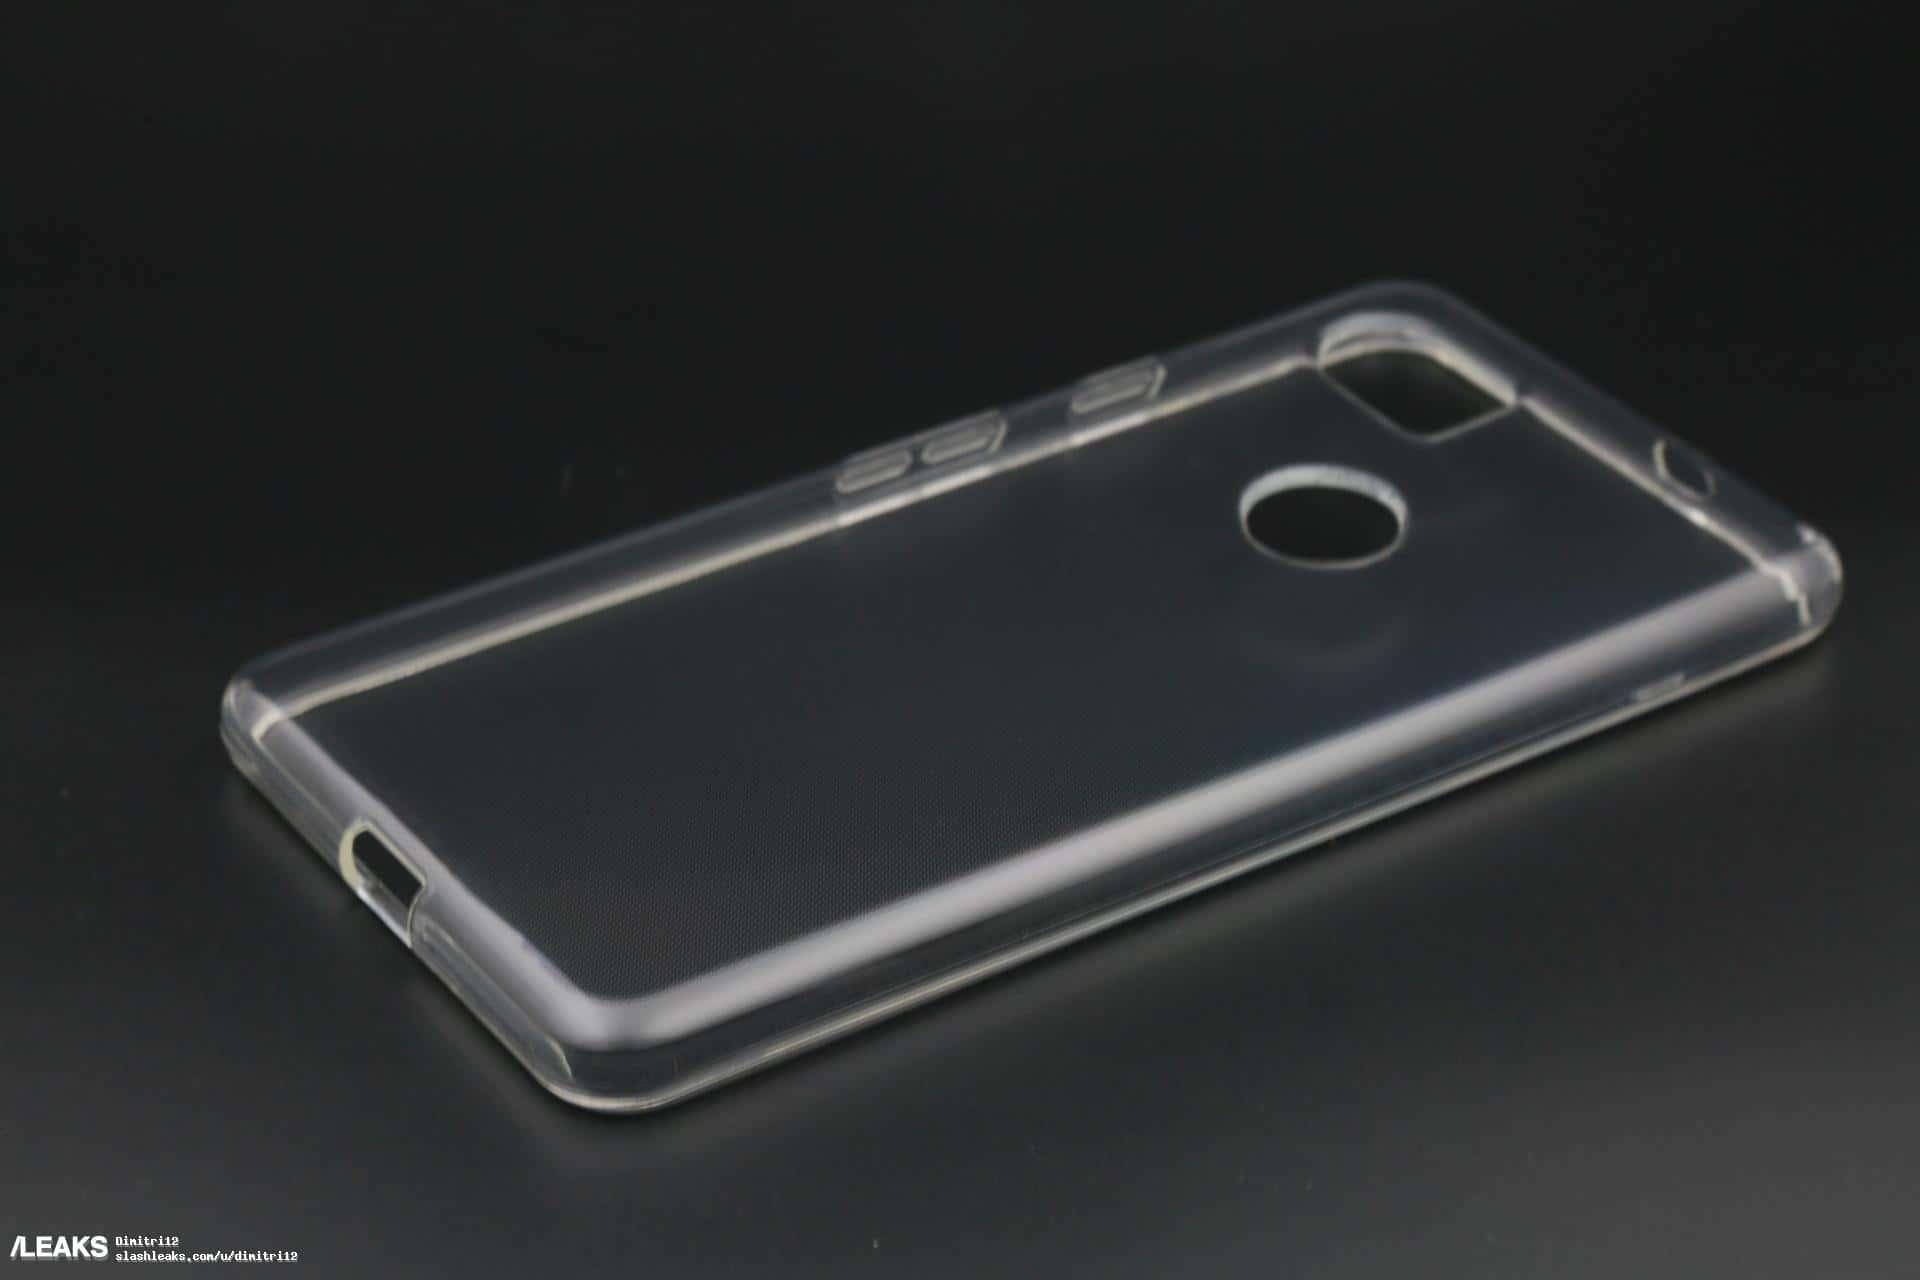 Google Pixel XL 2 Case SlashLeaks 3